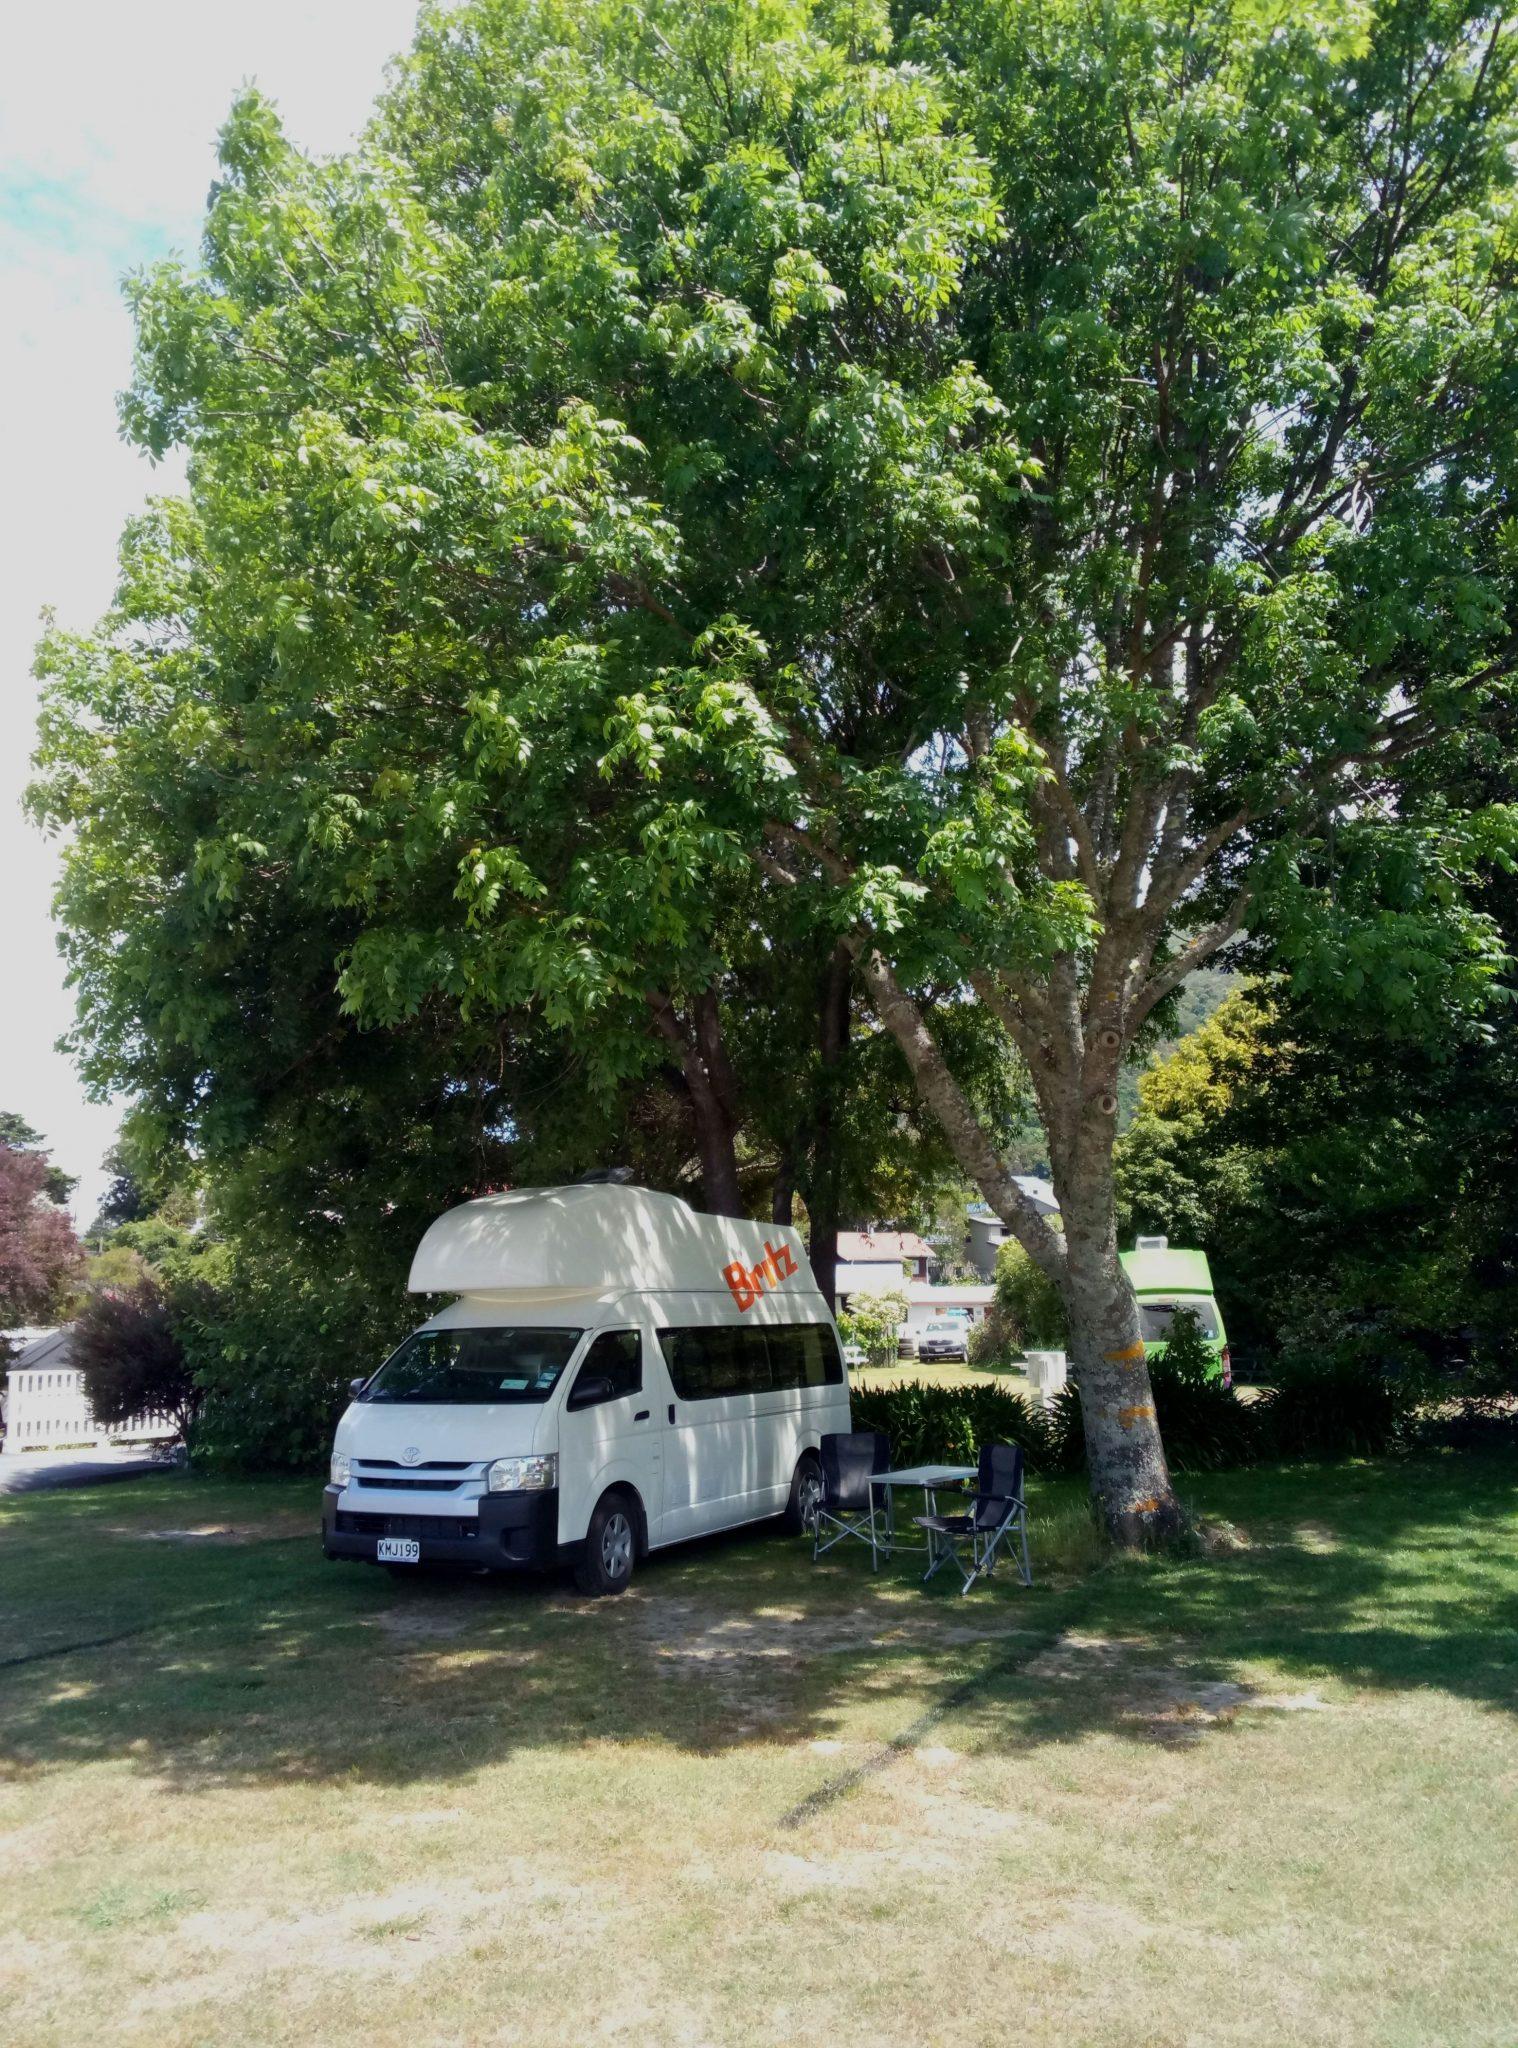 Power Site - small van